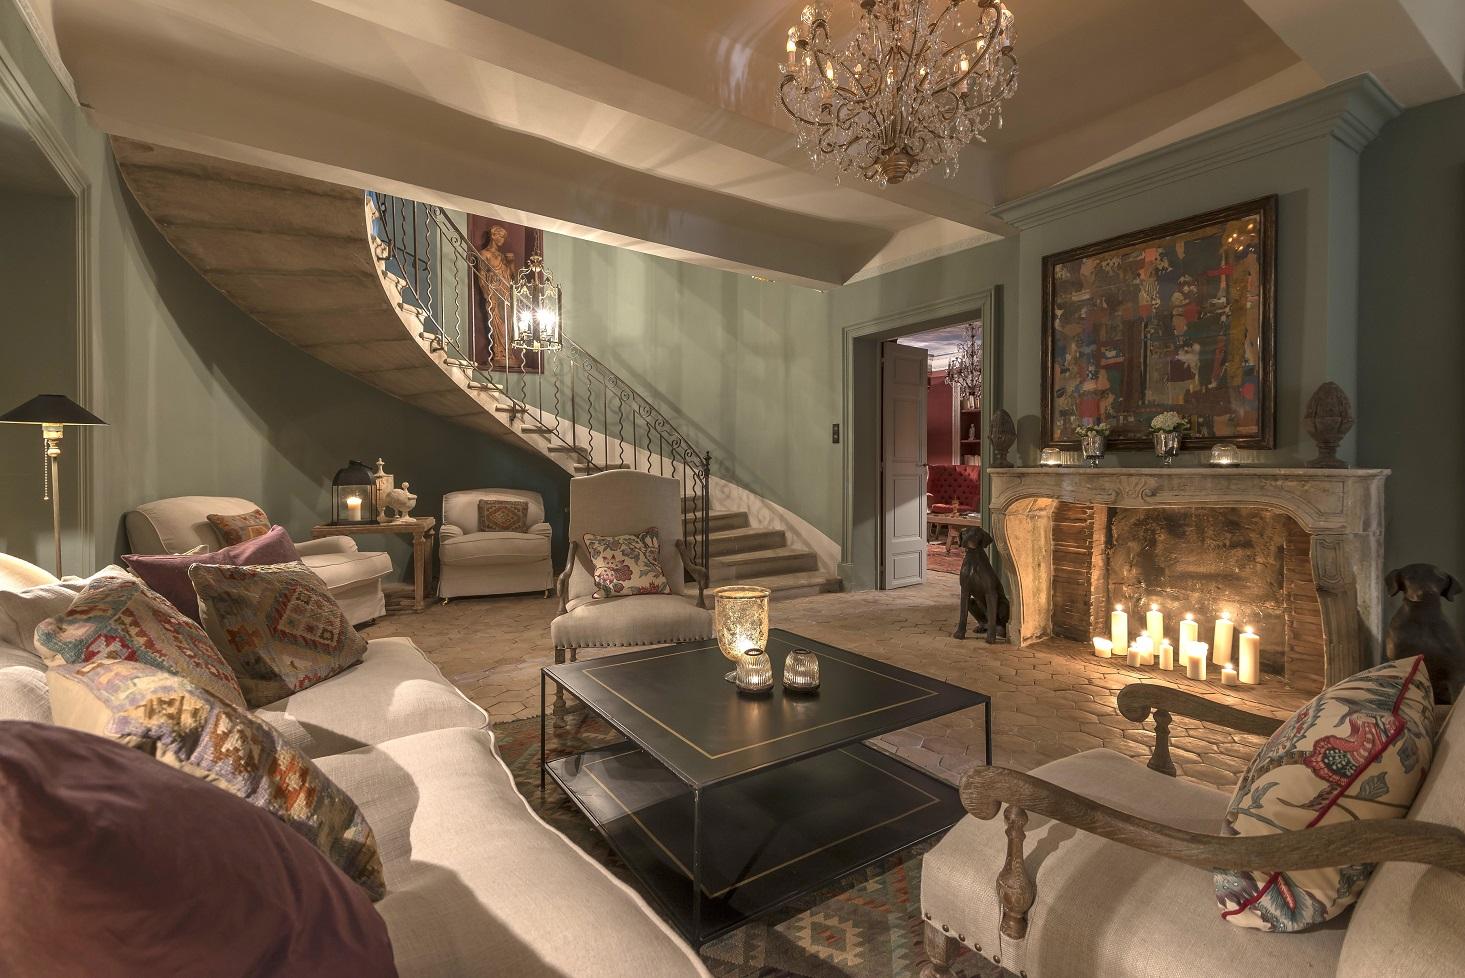 Hotel domaine de la baume in tourtour provence france white blancmange - Hotel bb salon de provence ...